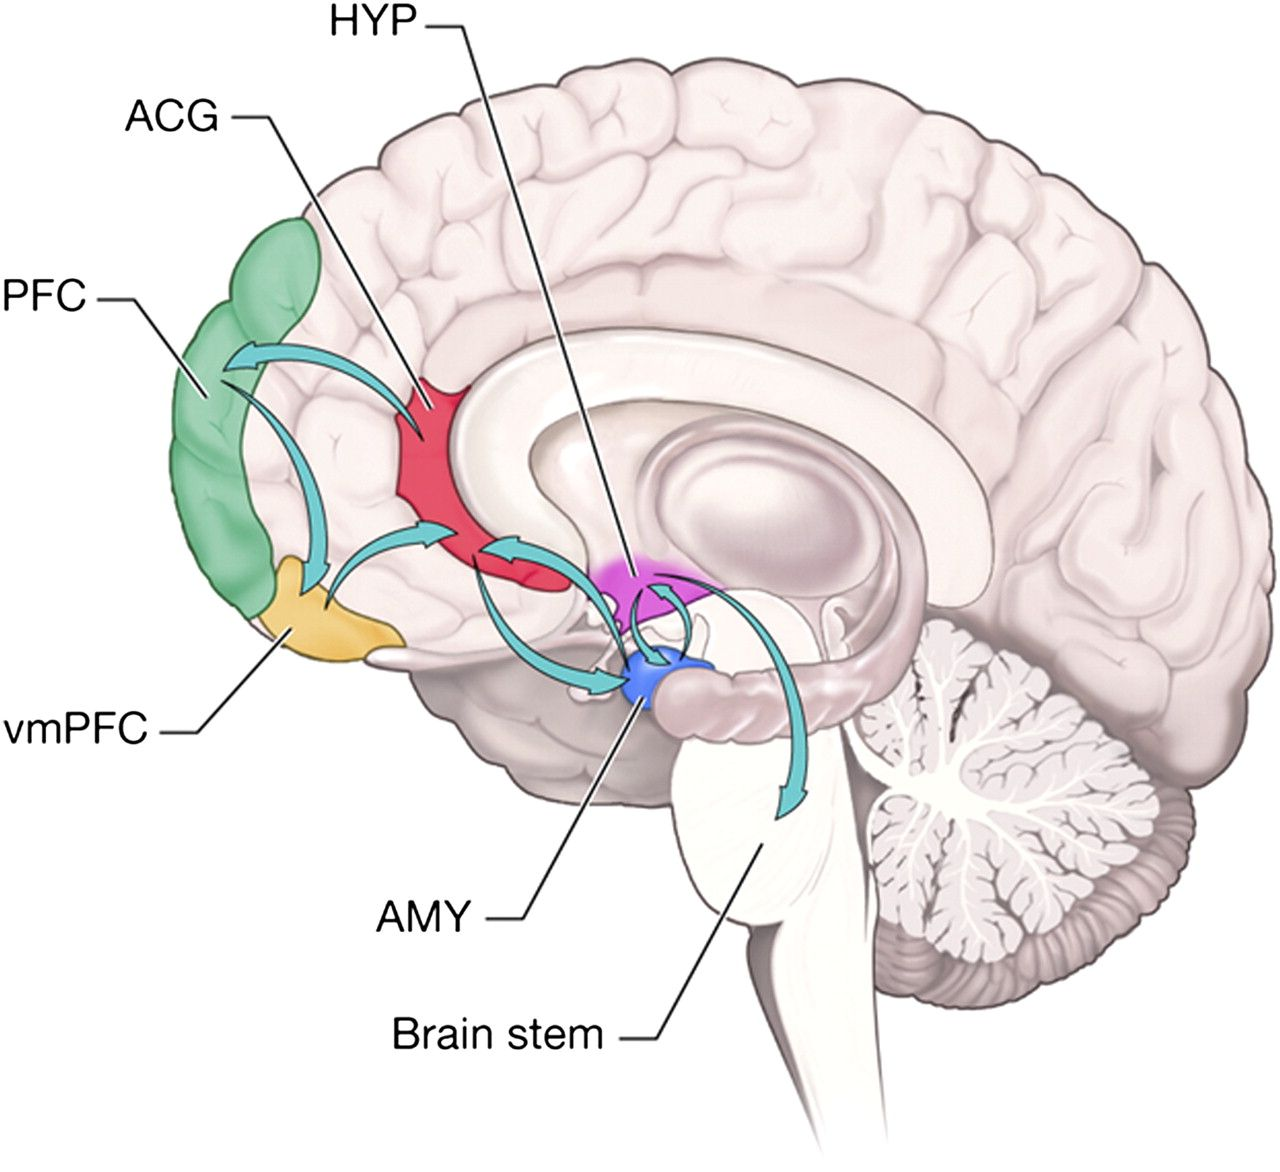 inhibiting fear and aggression ventromedial pre frontal cortex pre frontal cortex anterior. Black Bedroom Furniture Sets. Home Design Ideas